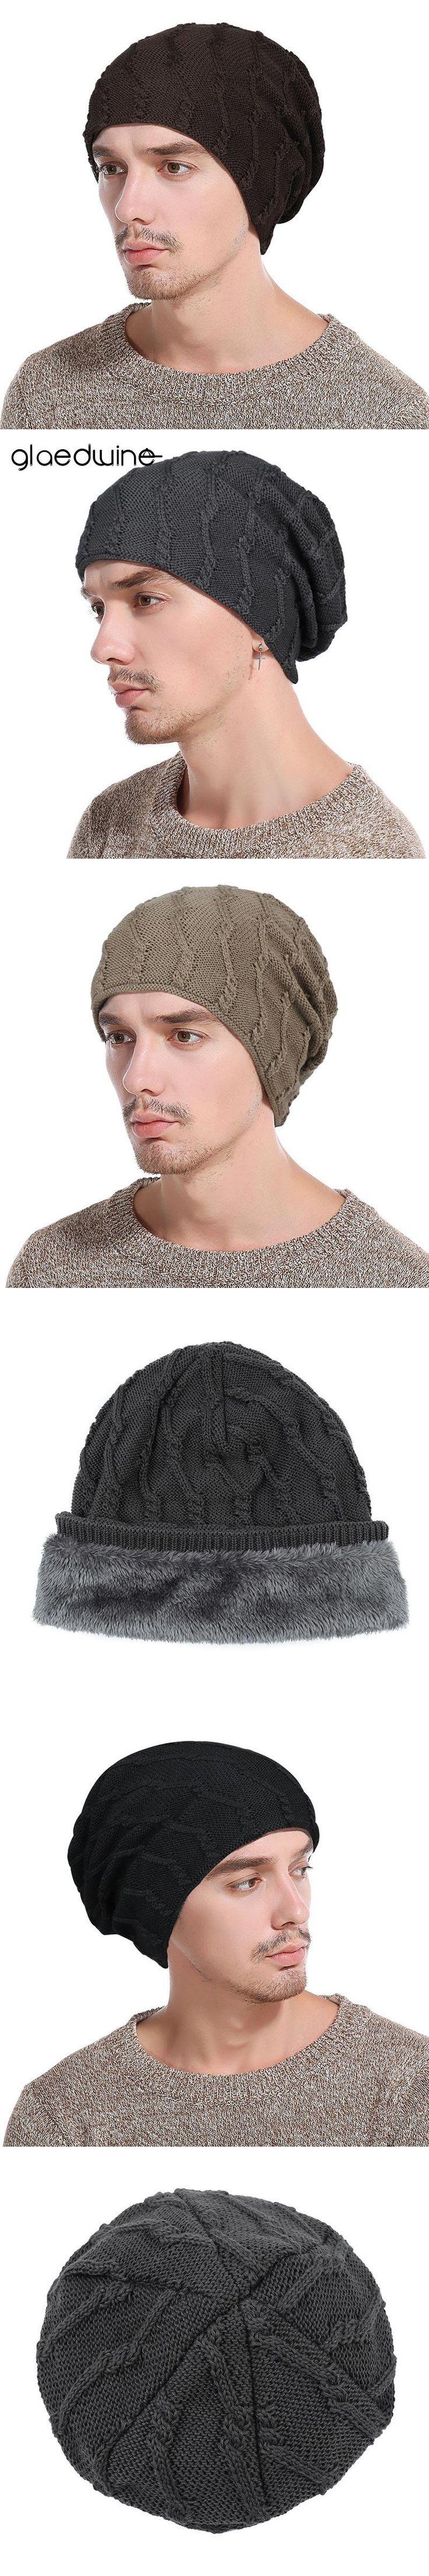 Glaedwine Fashion Men's Bonnet Hat Beanies Warm Winter Hats Knitting Skullies Caps For Men balaclava Brand Keep warm ears Cap